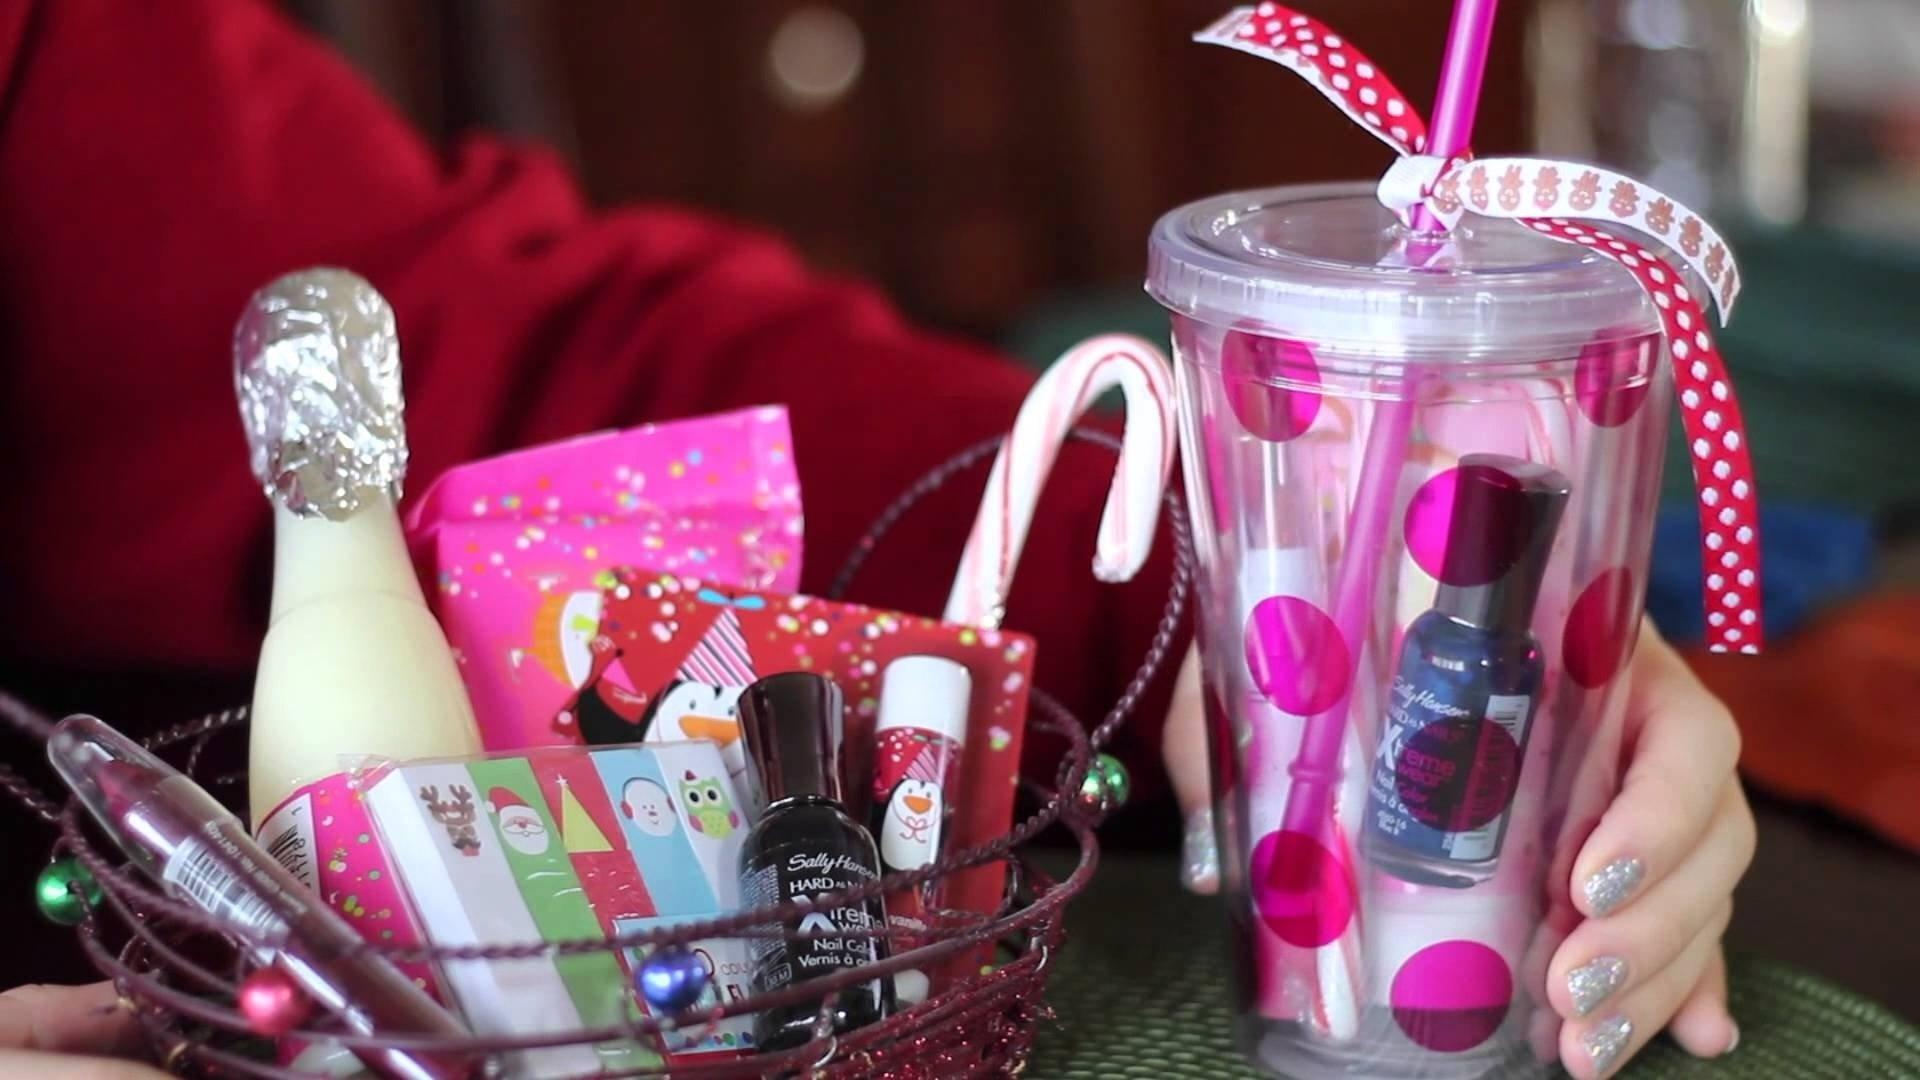 10 Fashionable Cute Christmas Gift Ideas For Friends cute diy gift ideas cheap easy and fun youtube 2021